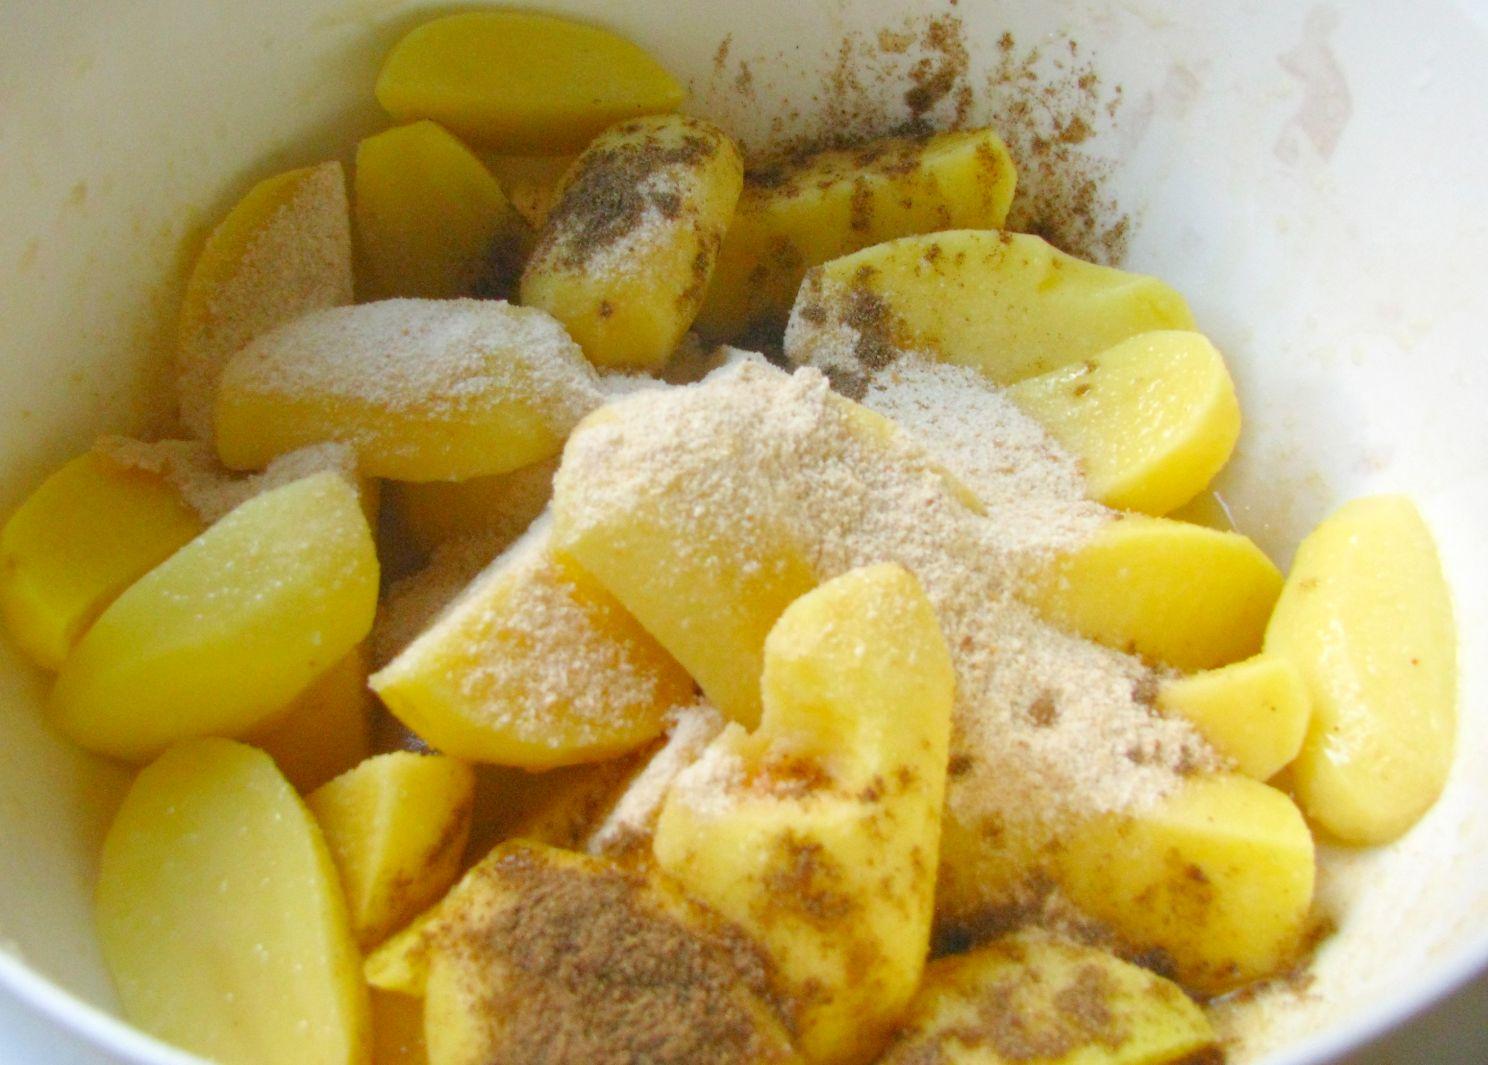 struhankove krumple suroviny